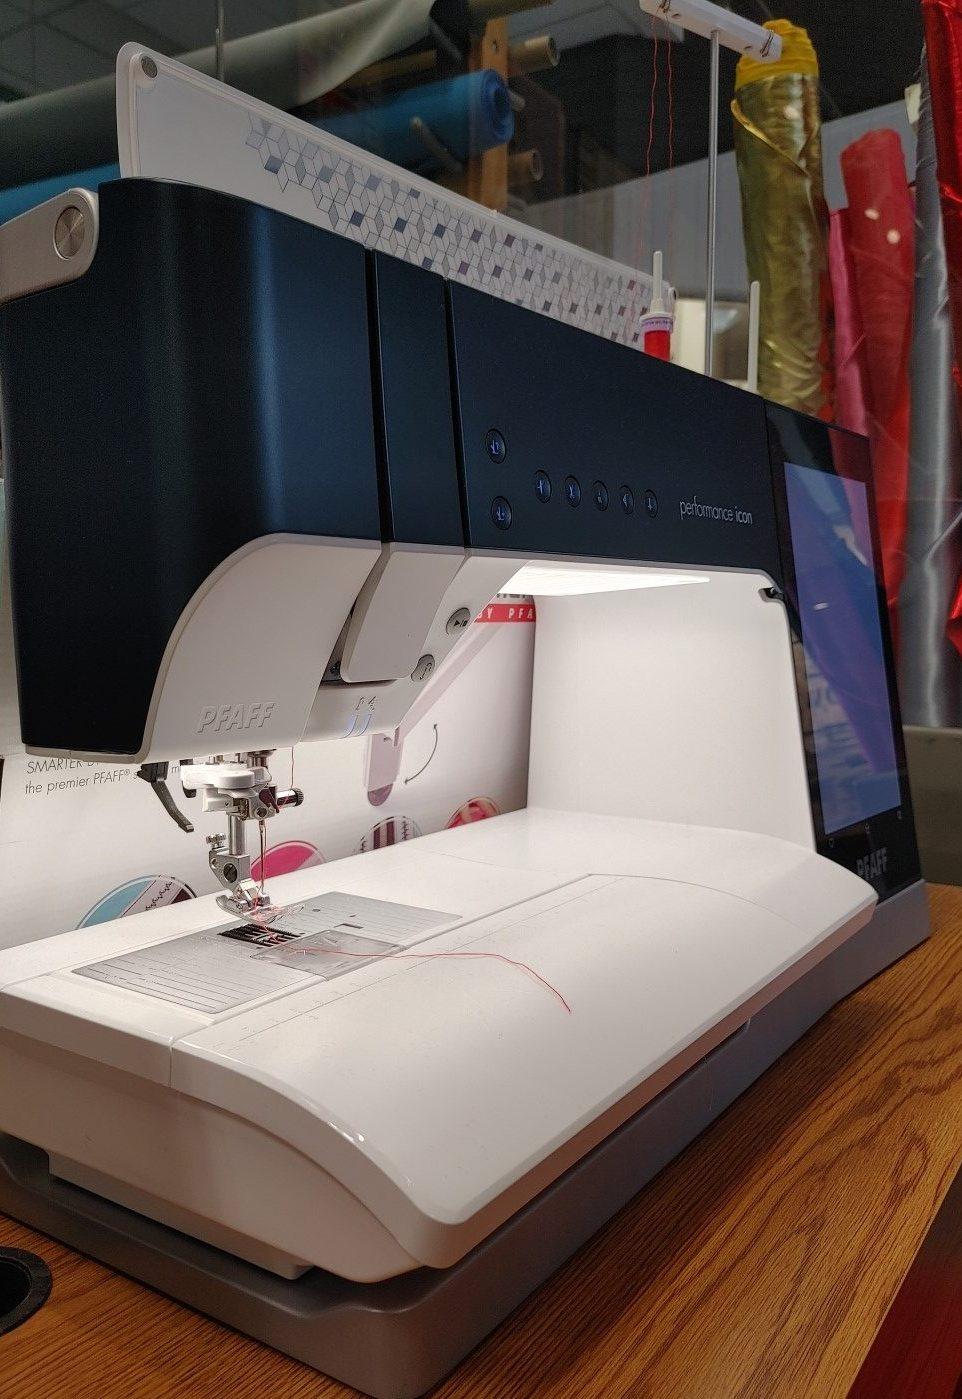 Pfaff Sewing Machines